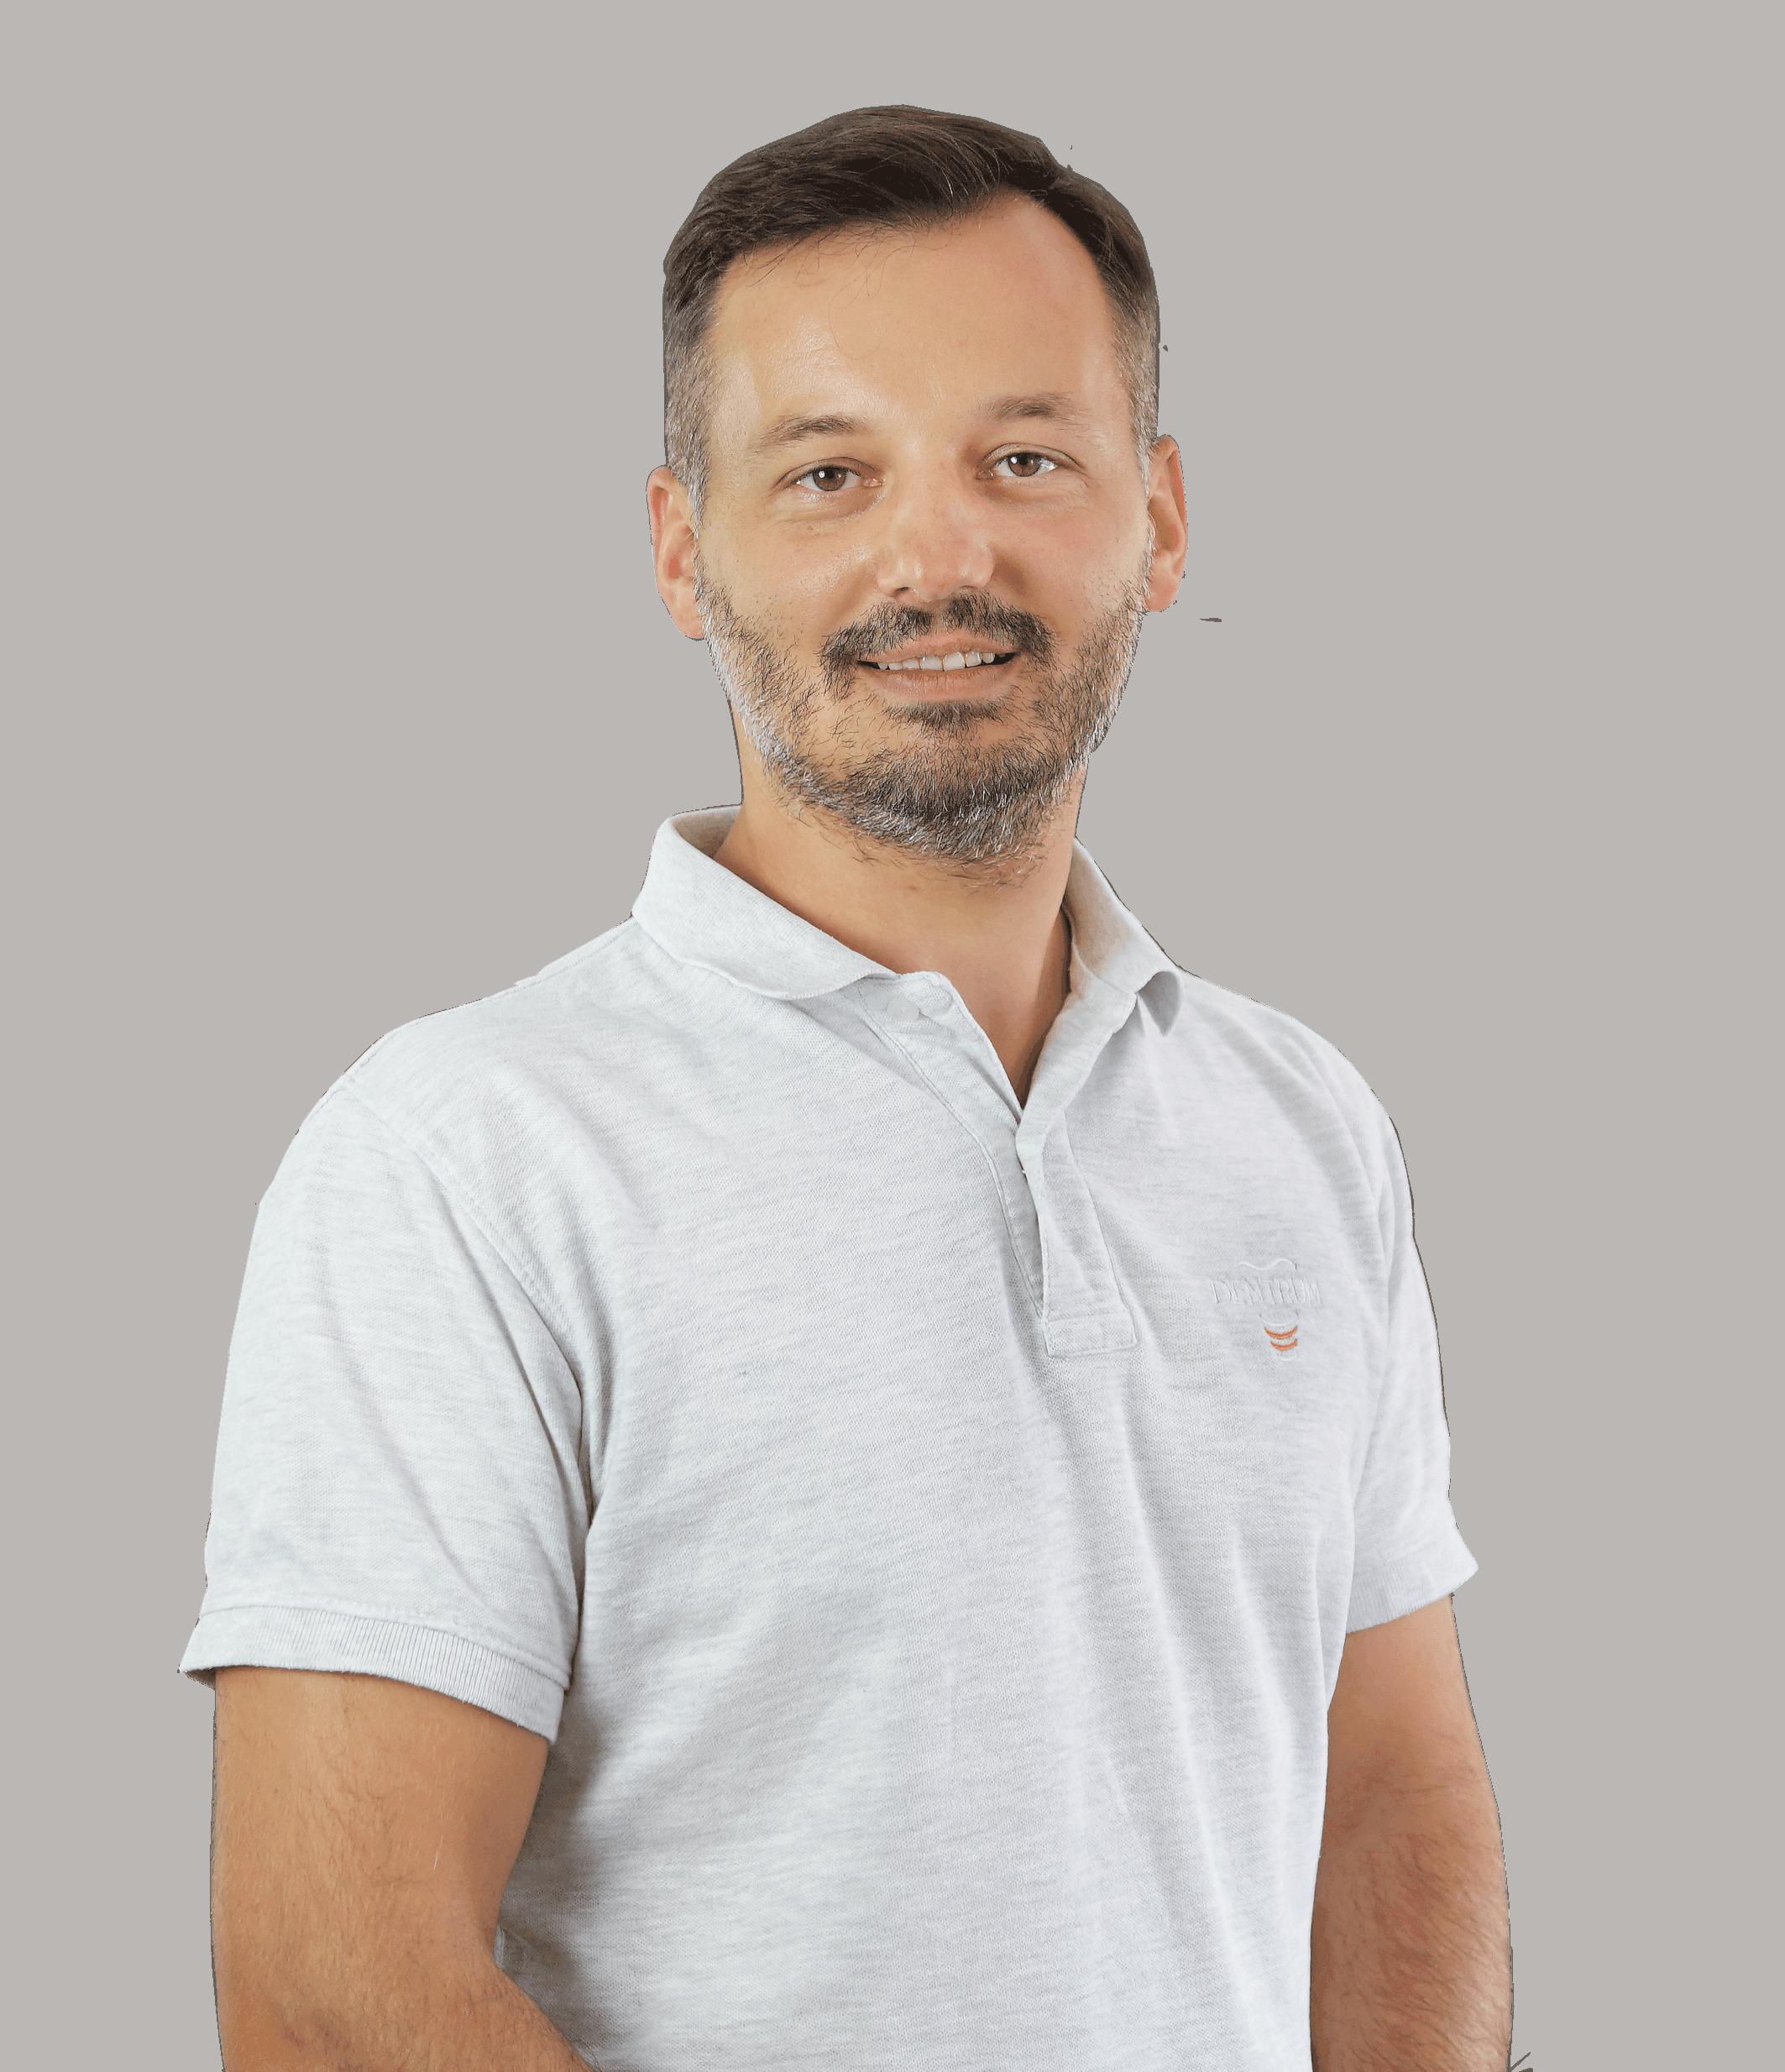 Daniel Ciapiński